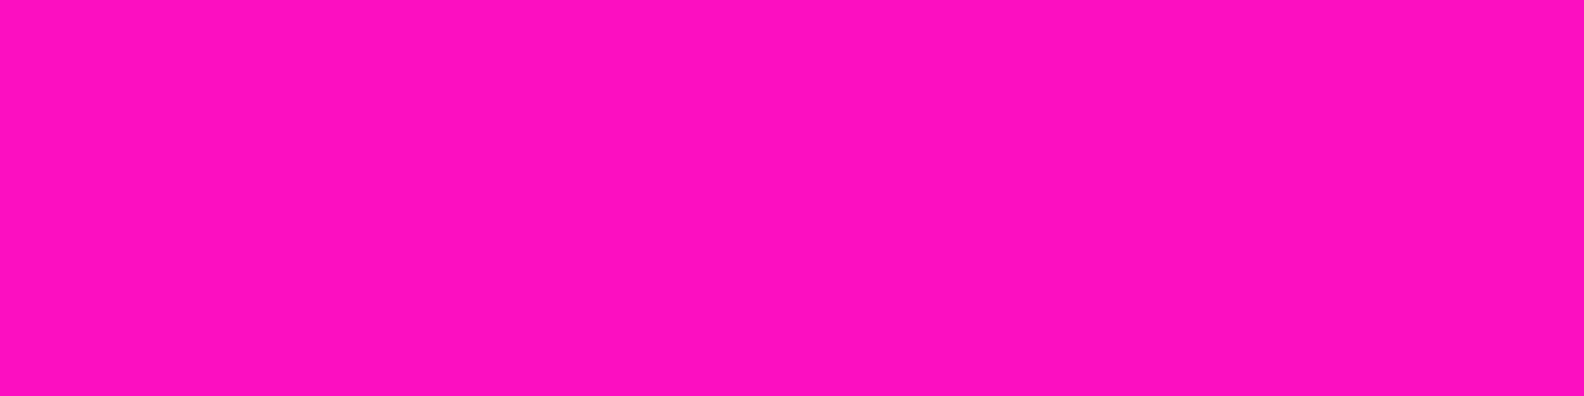 1584x396 Shocking Pink Solid Color Background